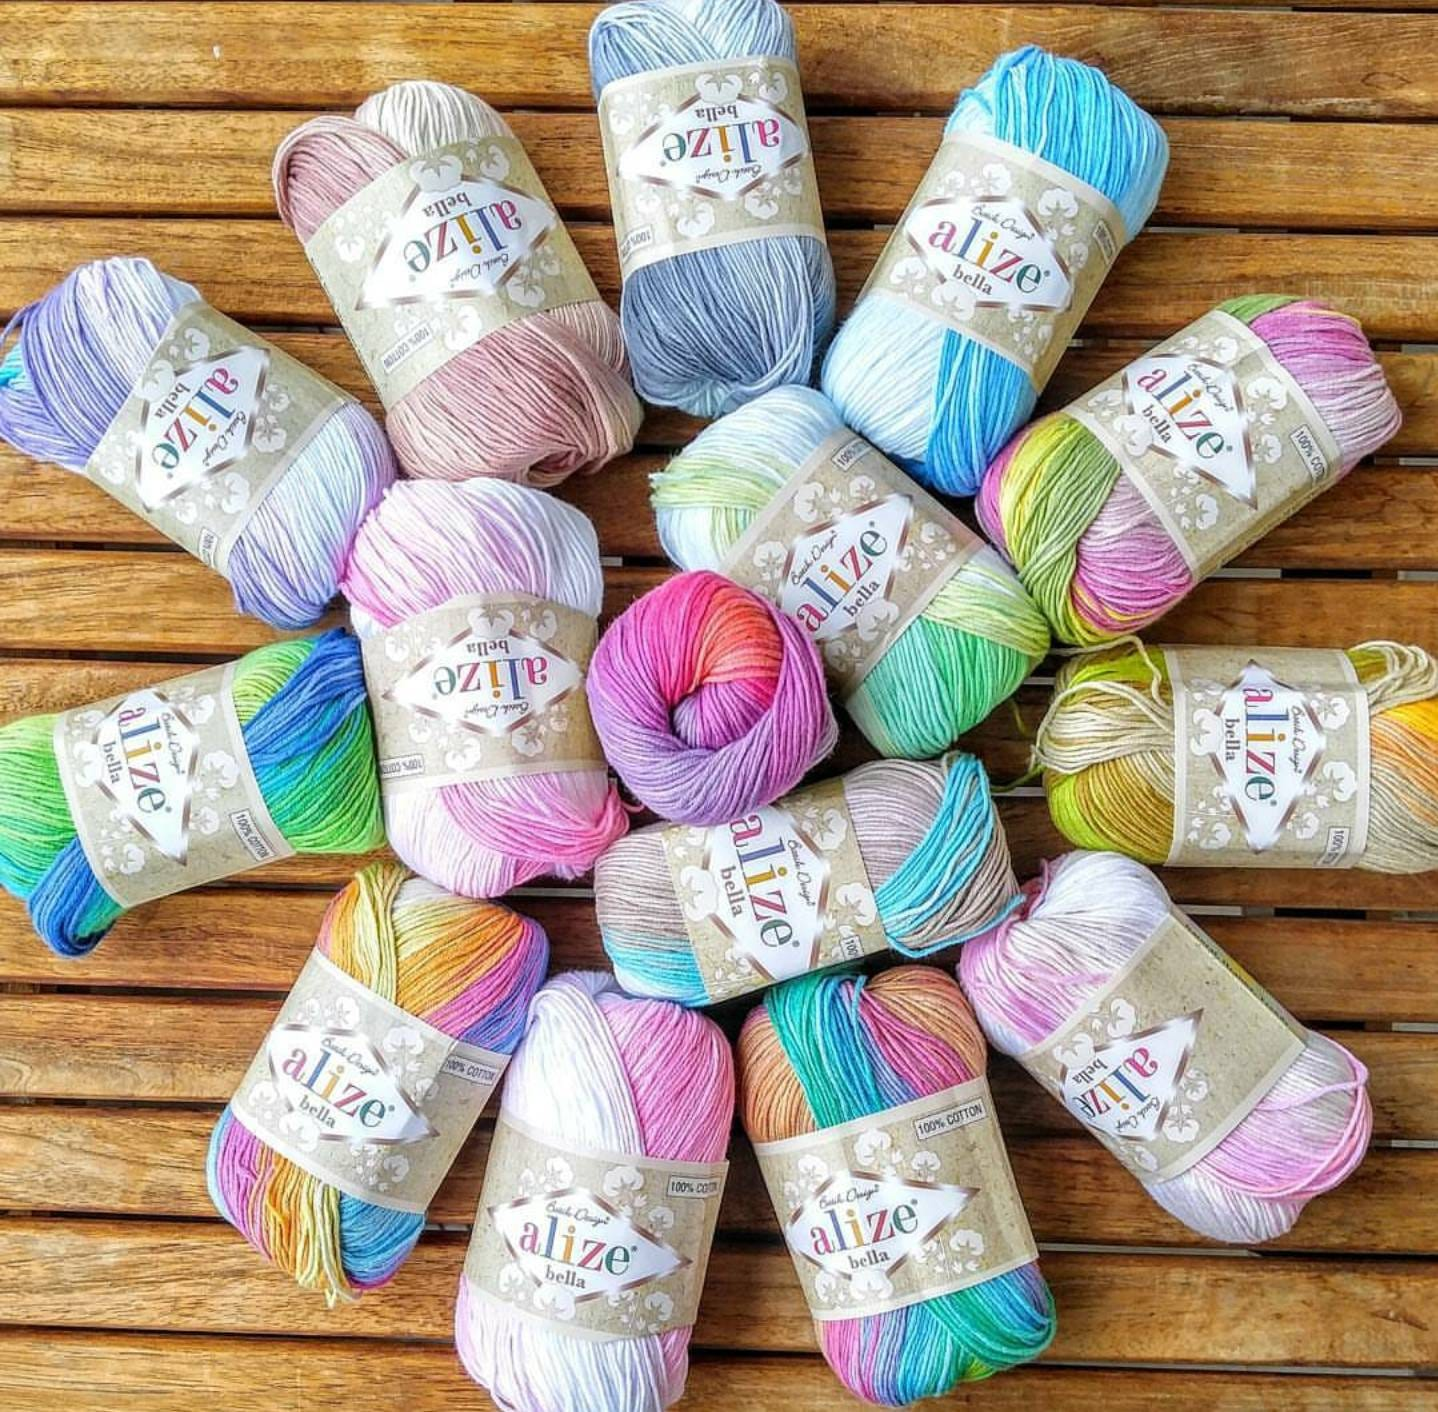 Alize Bella Batik %100 Cotton Yarn Crochet Yarn Knitting